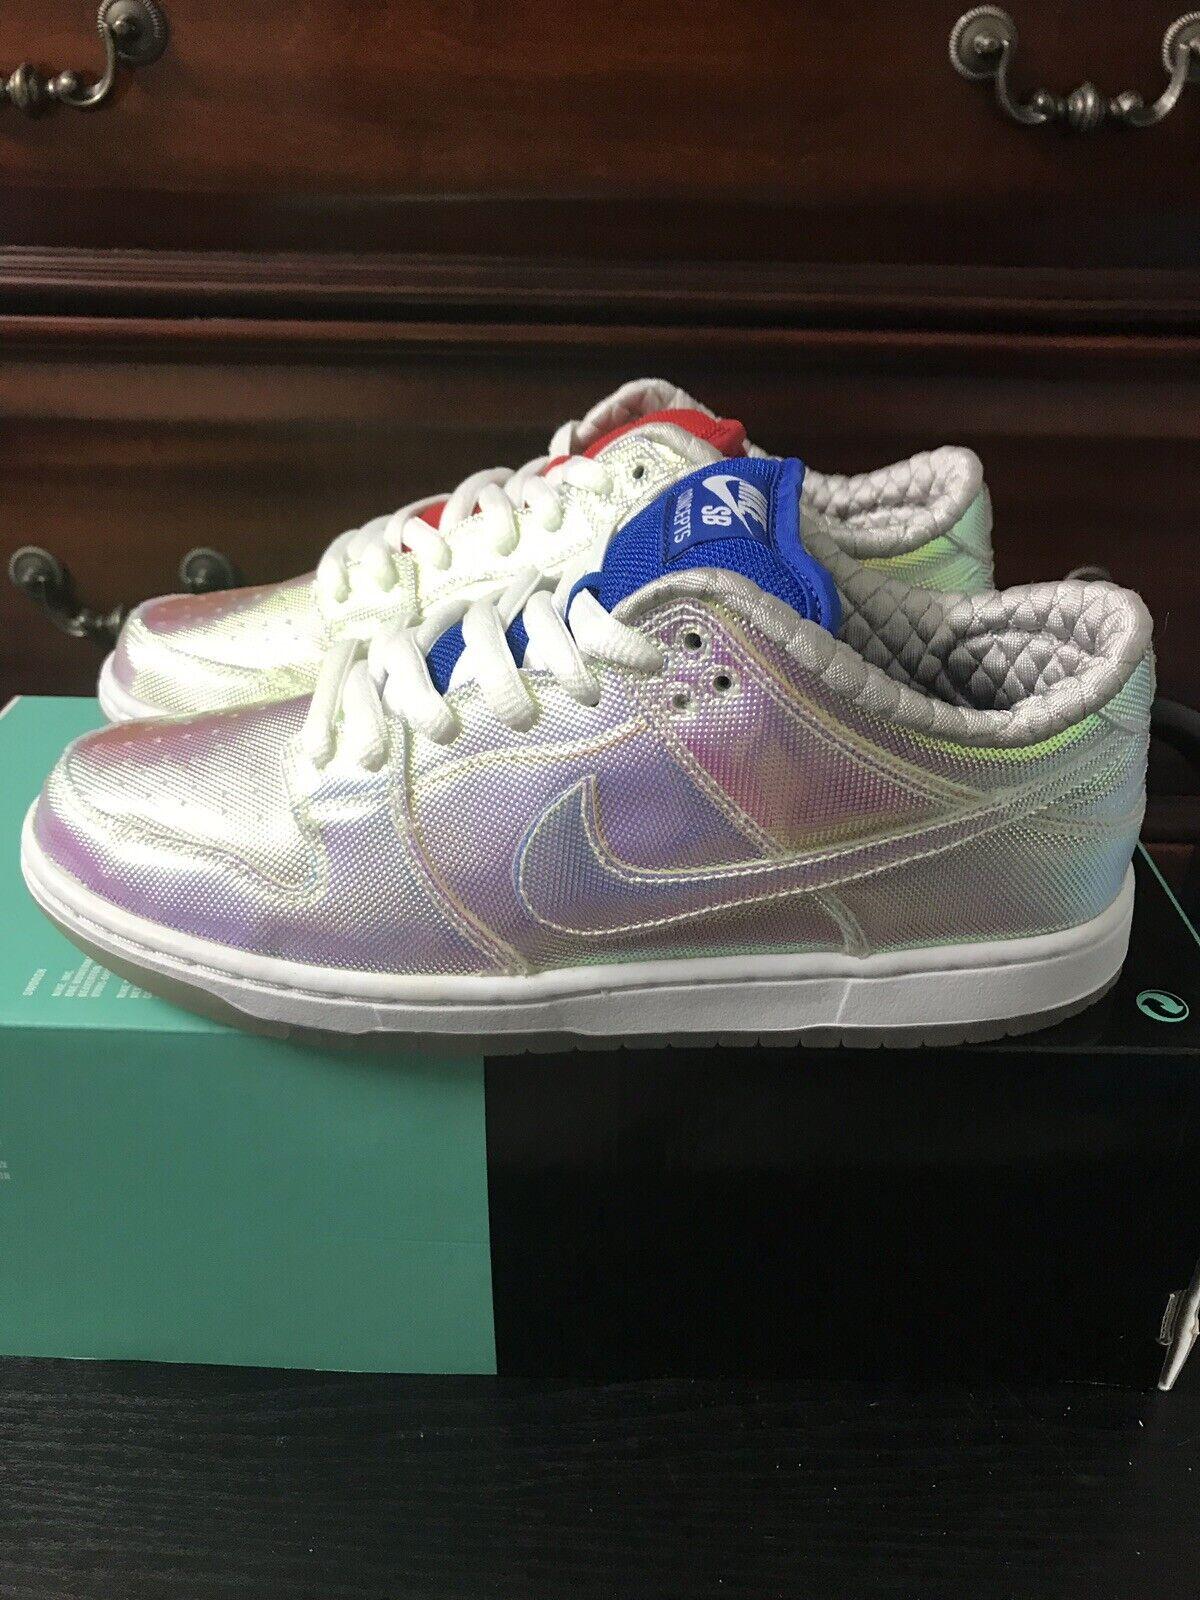 Nike Concepts Dunk Low Premium SB QS Grail White Silver 504750-140 Size 7.5